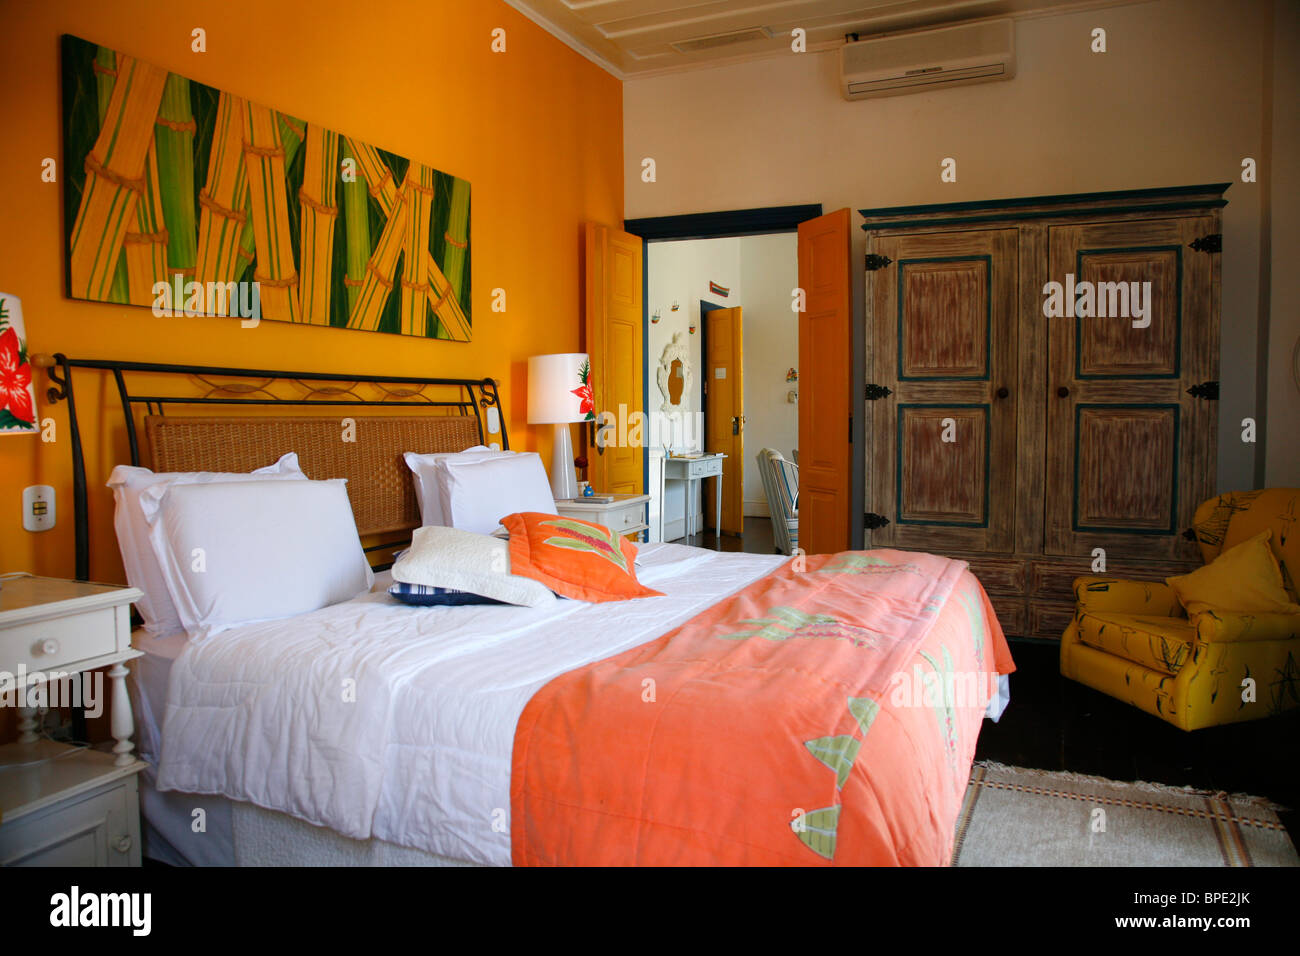 Pousada do Sandi, a luxury hotel in Parati, Rio de Janeiro State, Brazil. - Stock Image